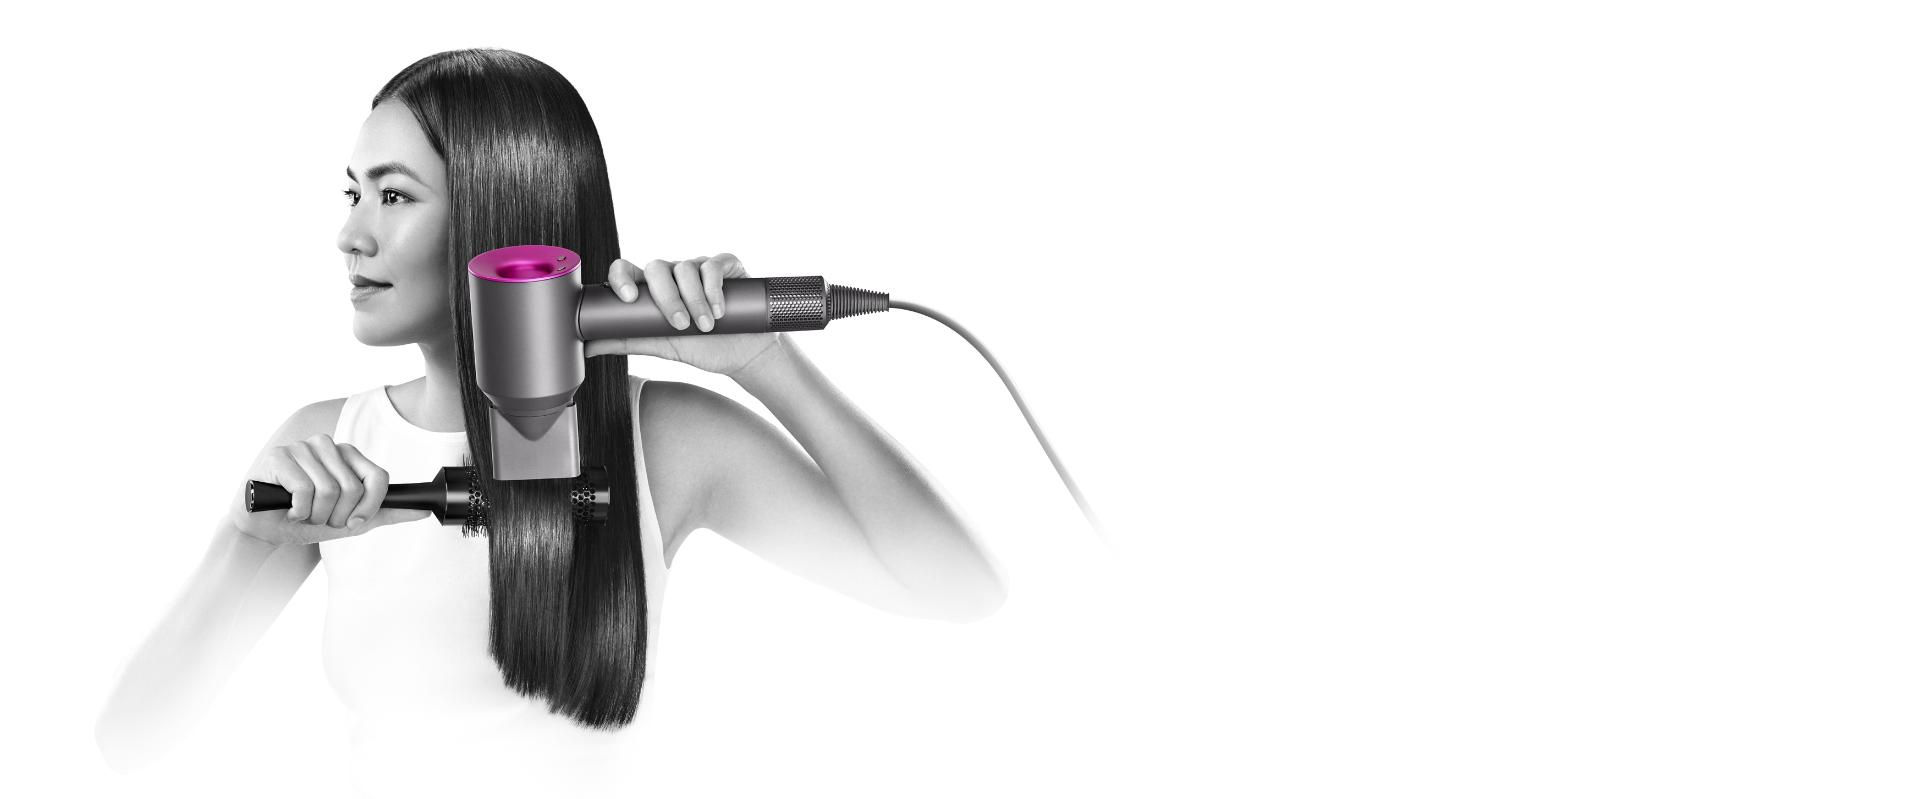 Dyson Supersonic™ saç kurutma makinesi modelleri